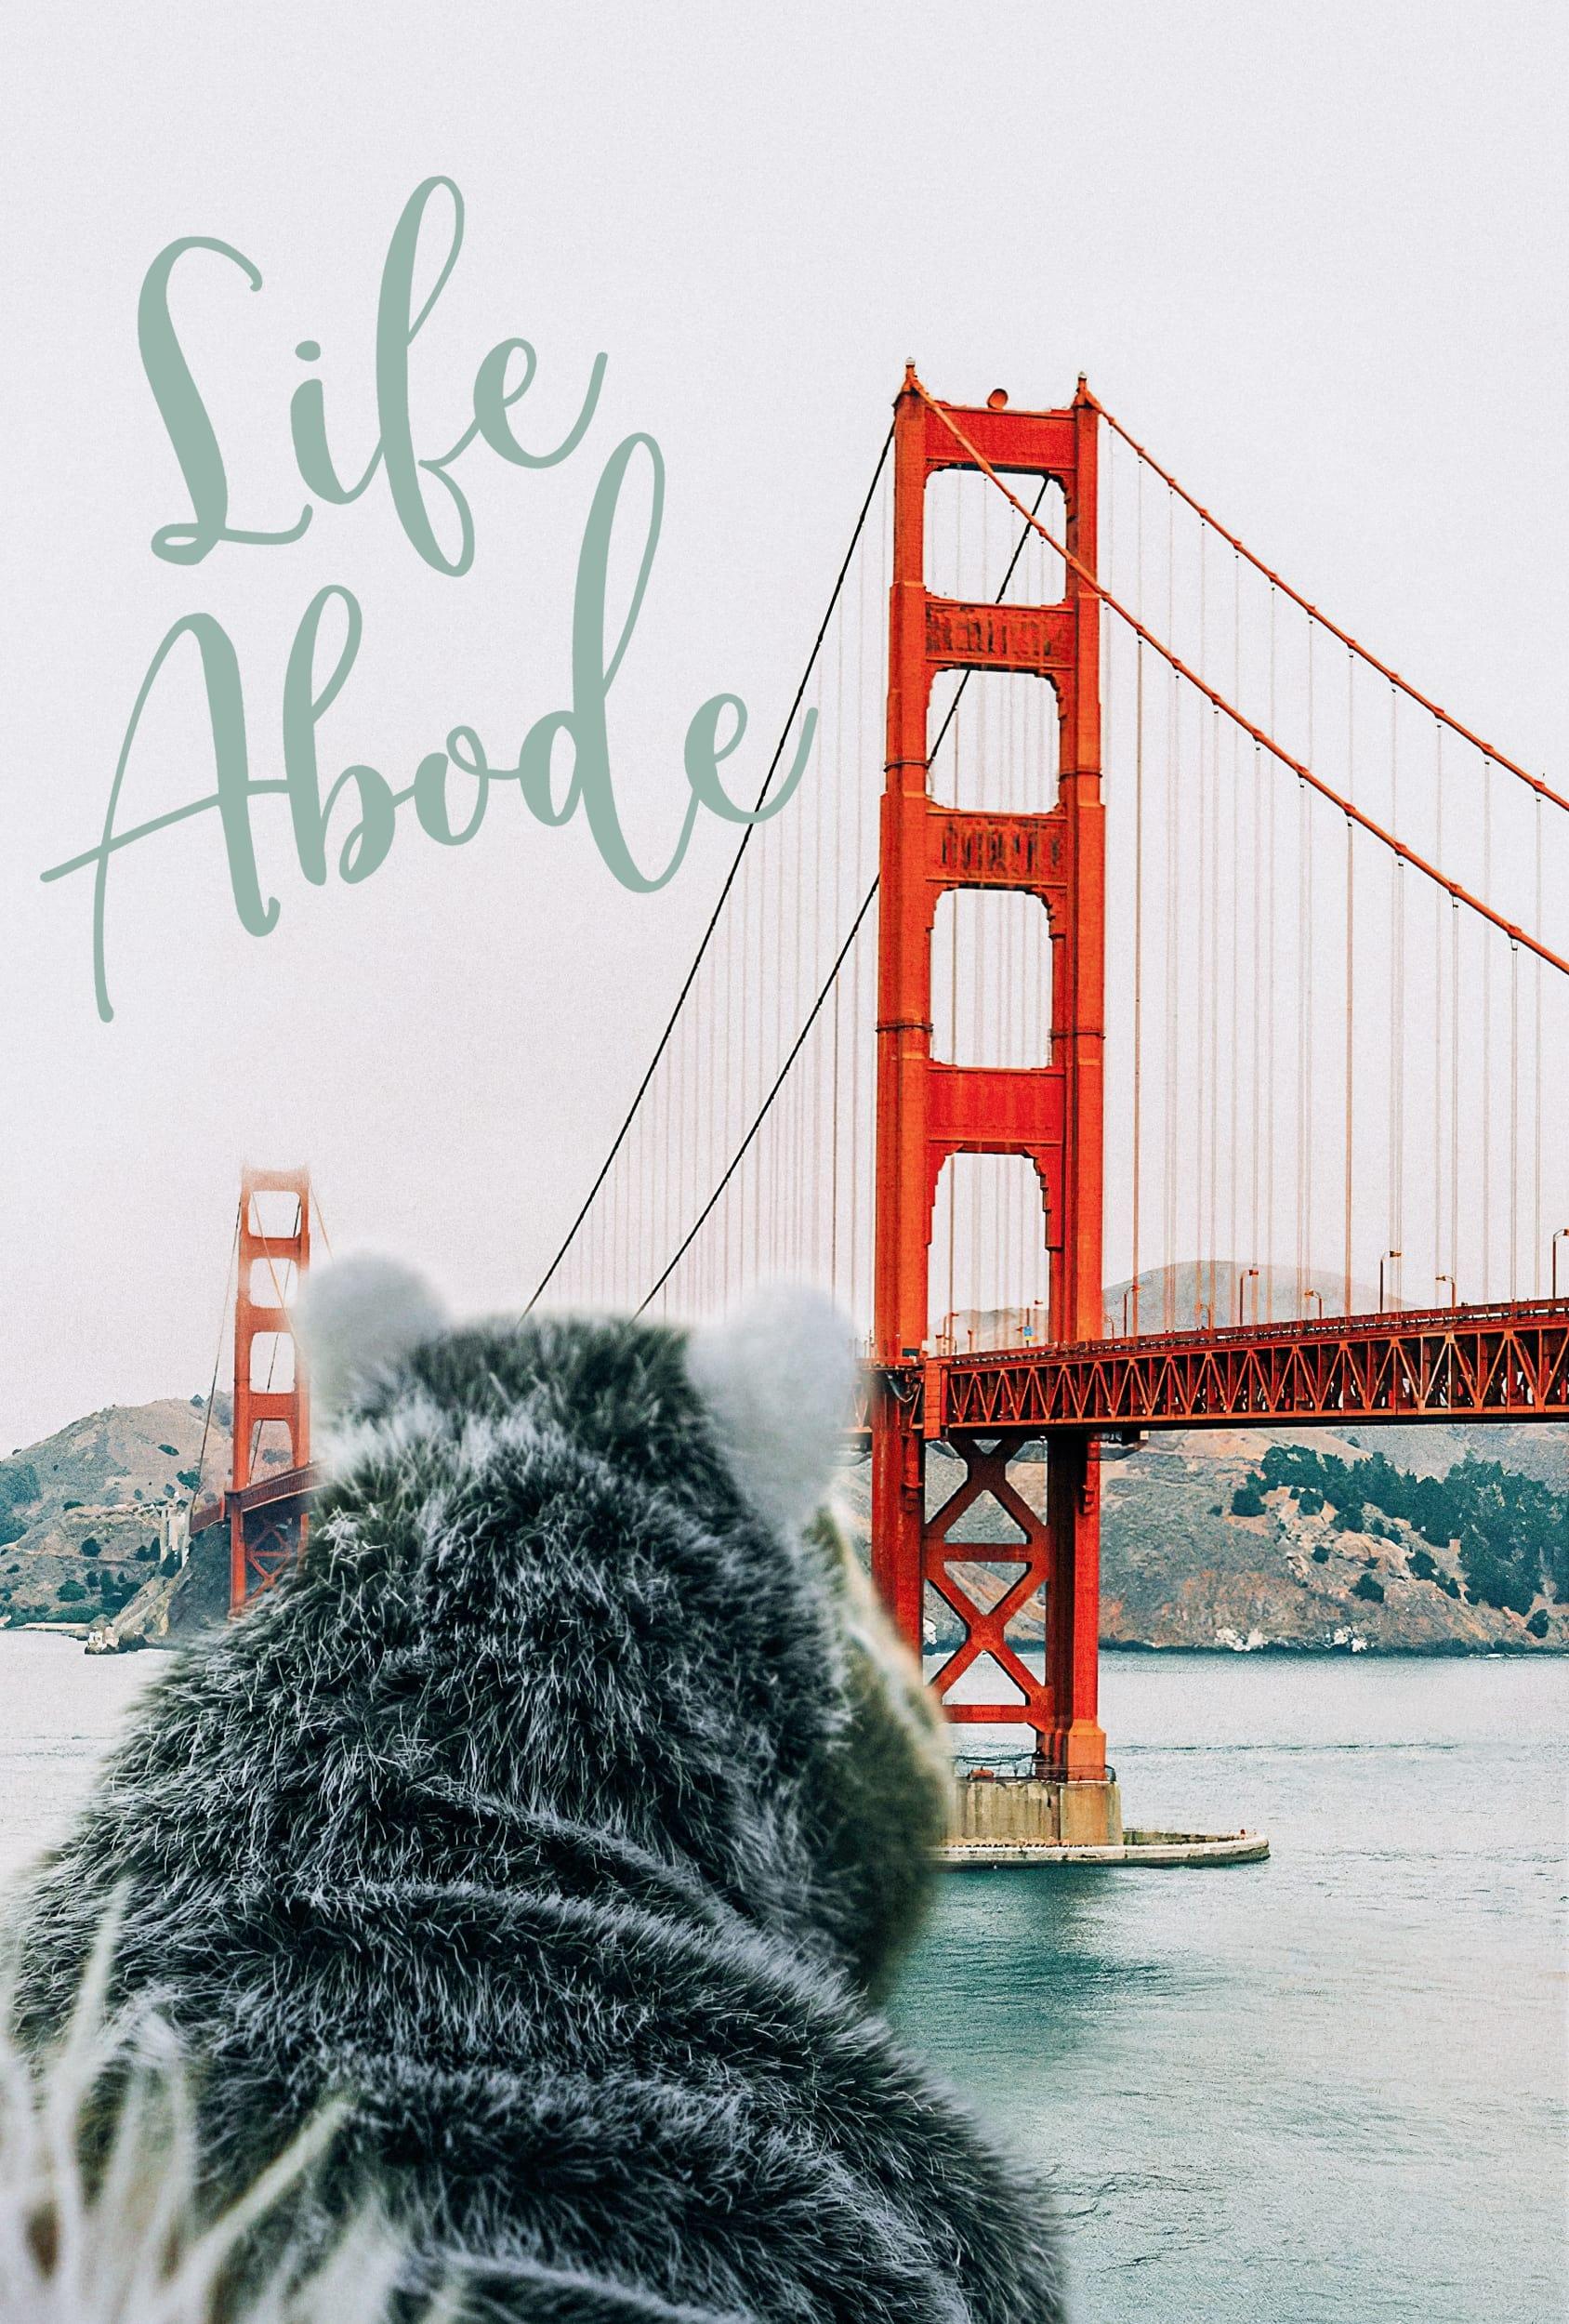 Life Abode